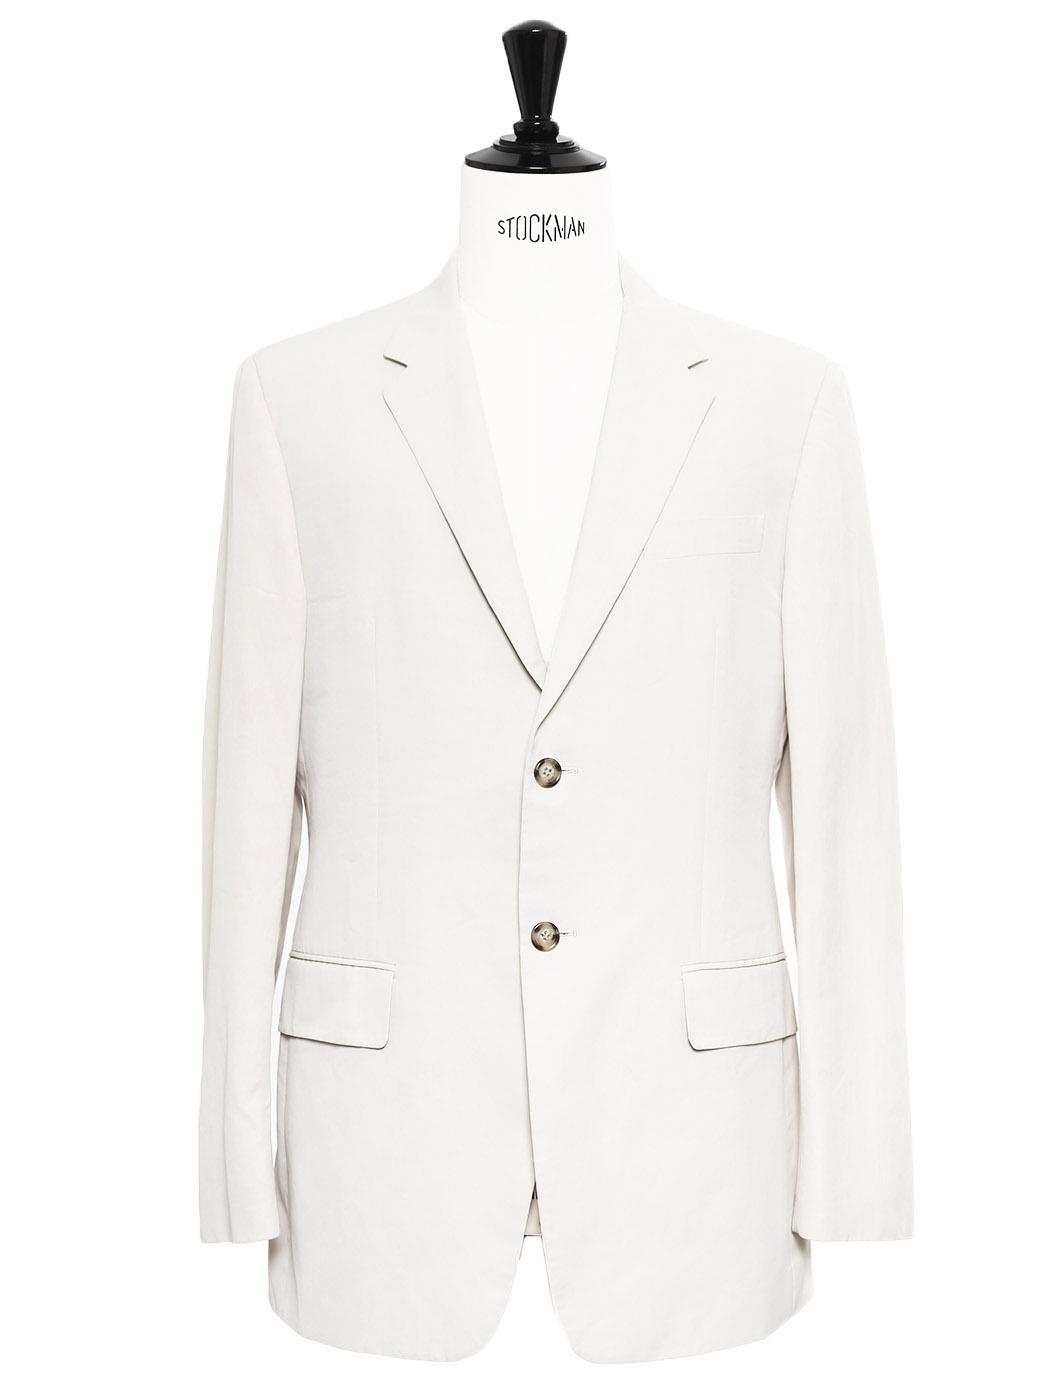 Louise paris prada veste blazer classique cr me cru for Taille baignoire classique